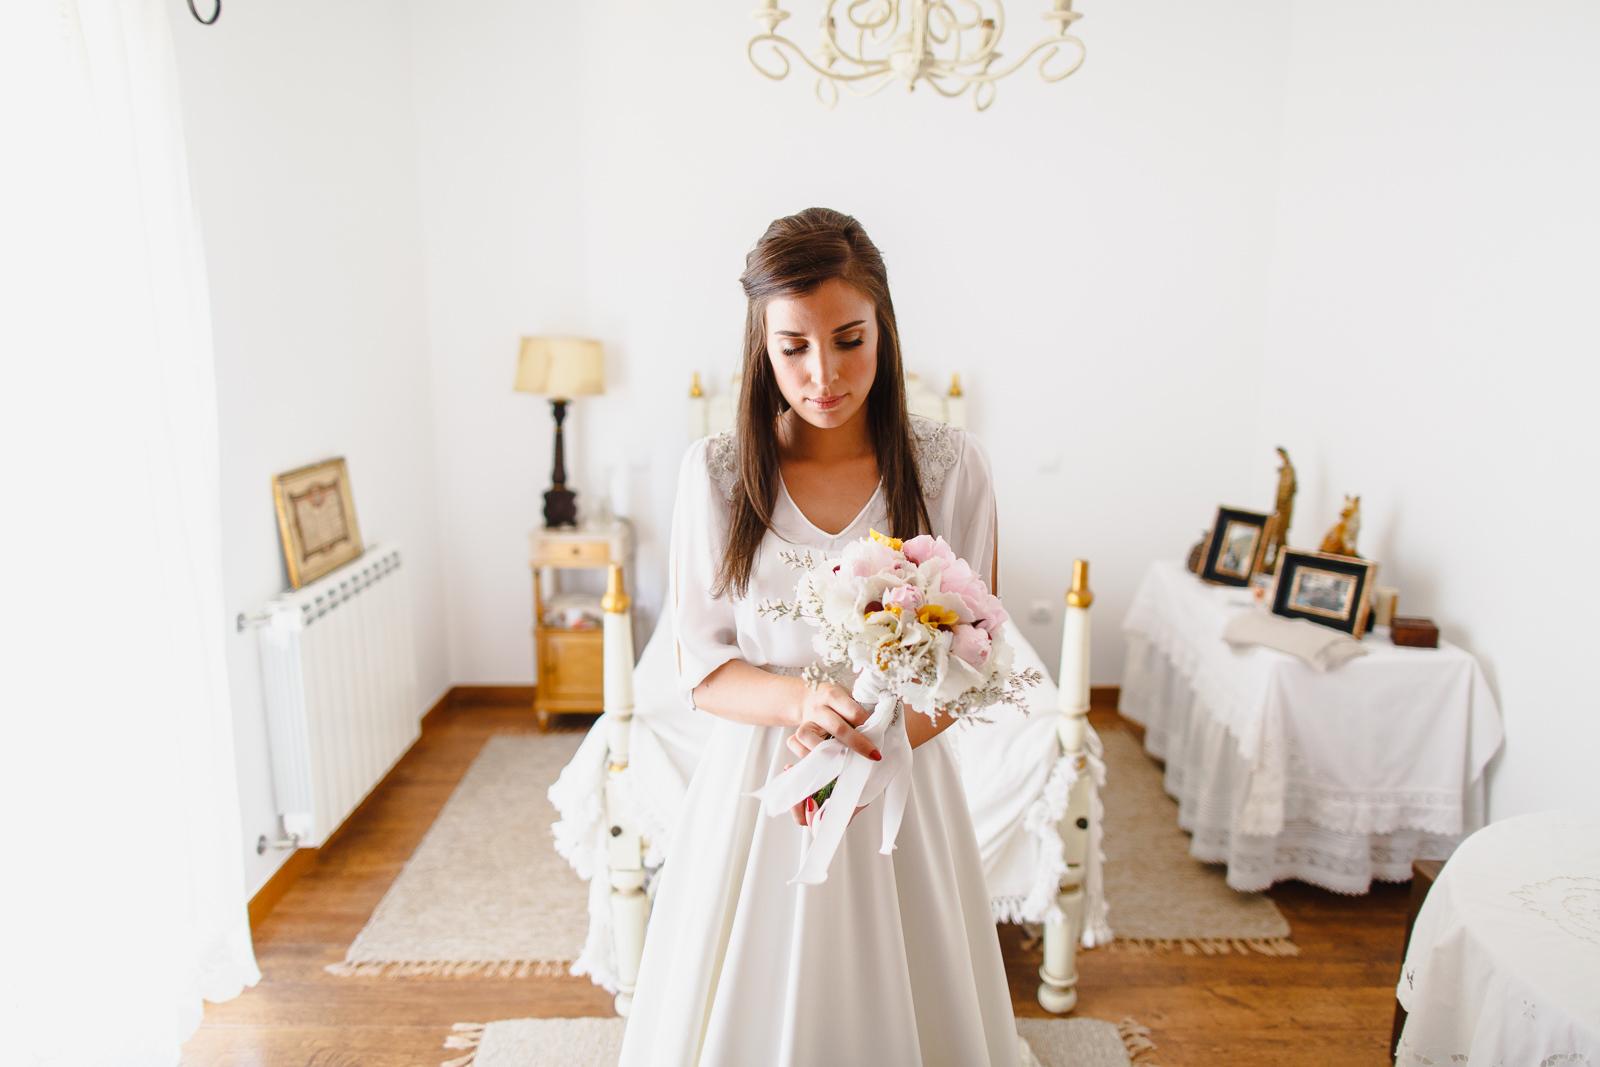 casamento_Ana_e_Carlos_5D2_9023.jpg